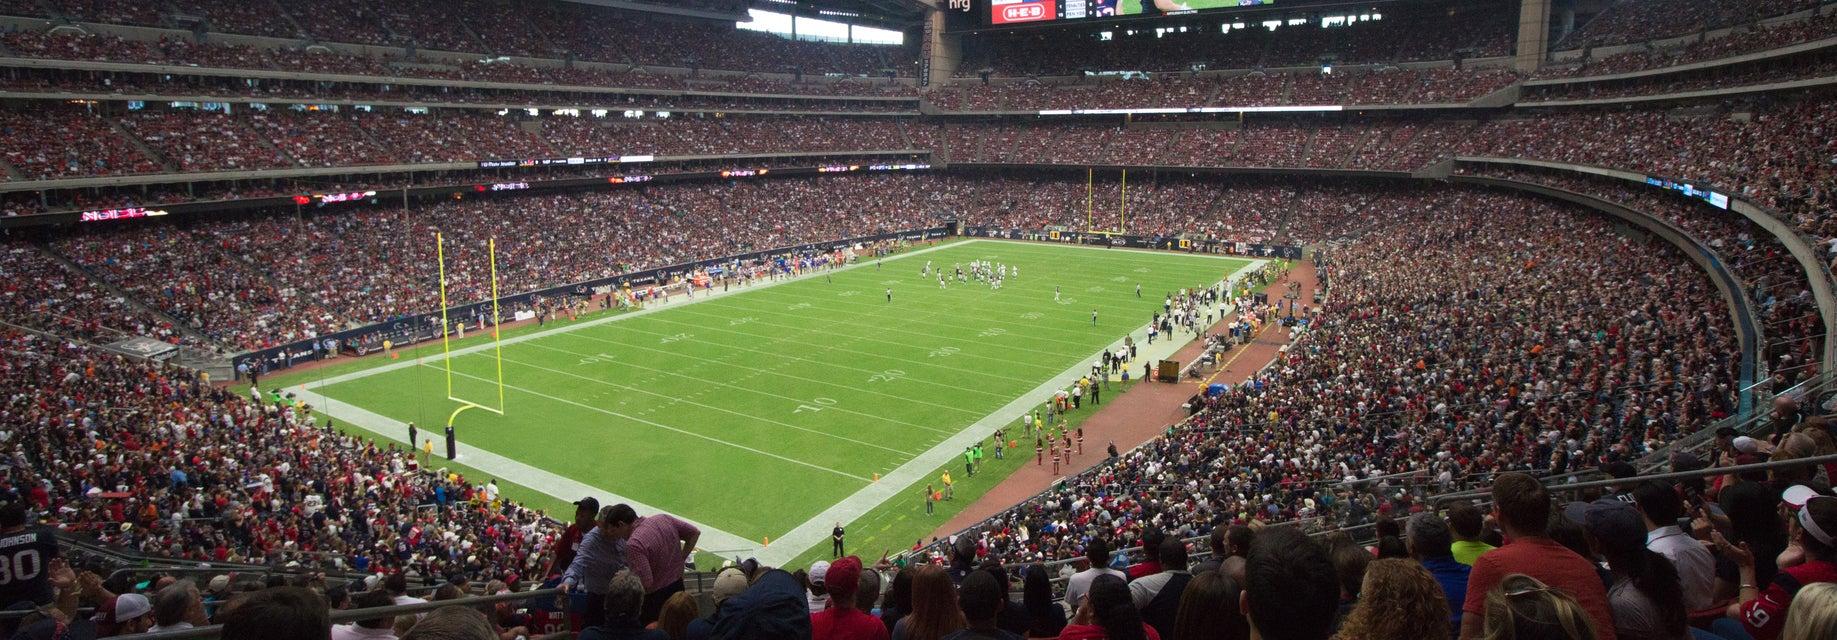 Seat view from Verizon Wireless Club II